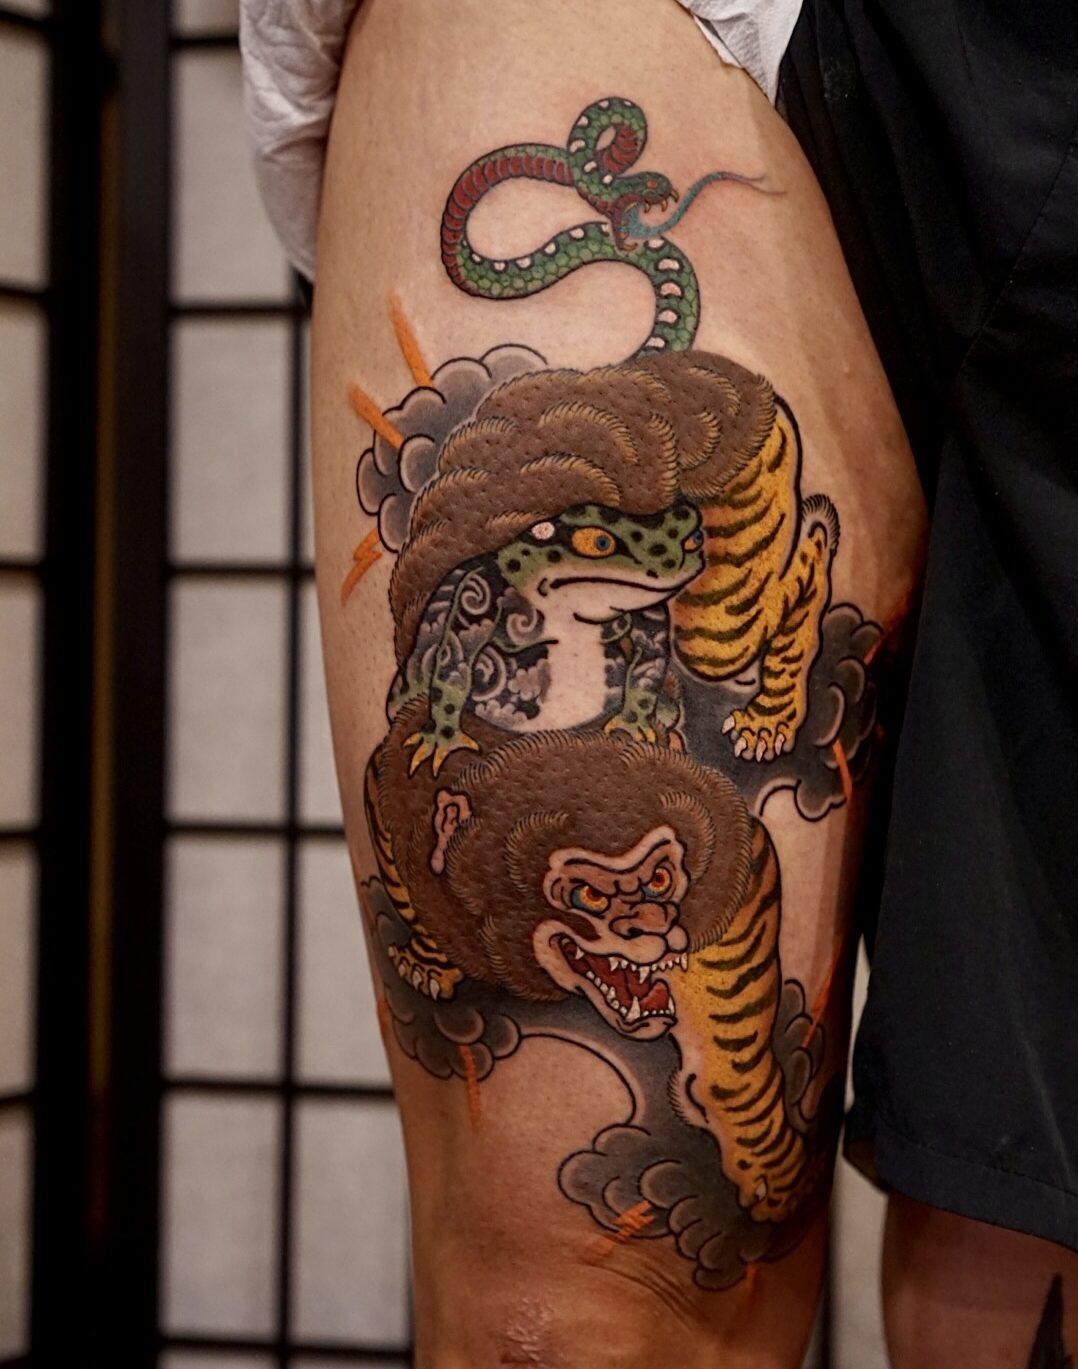 Baki, Qsun and Taymon Tattoo Studios, Busan, South Korea